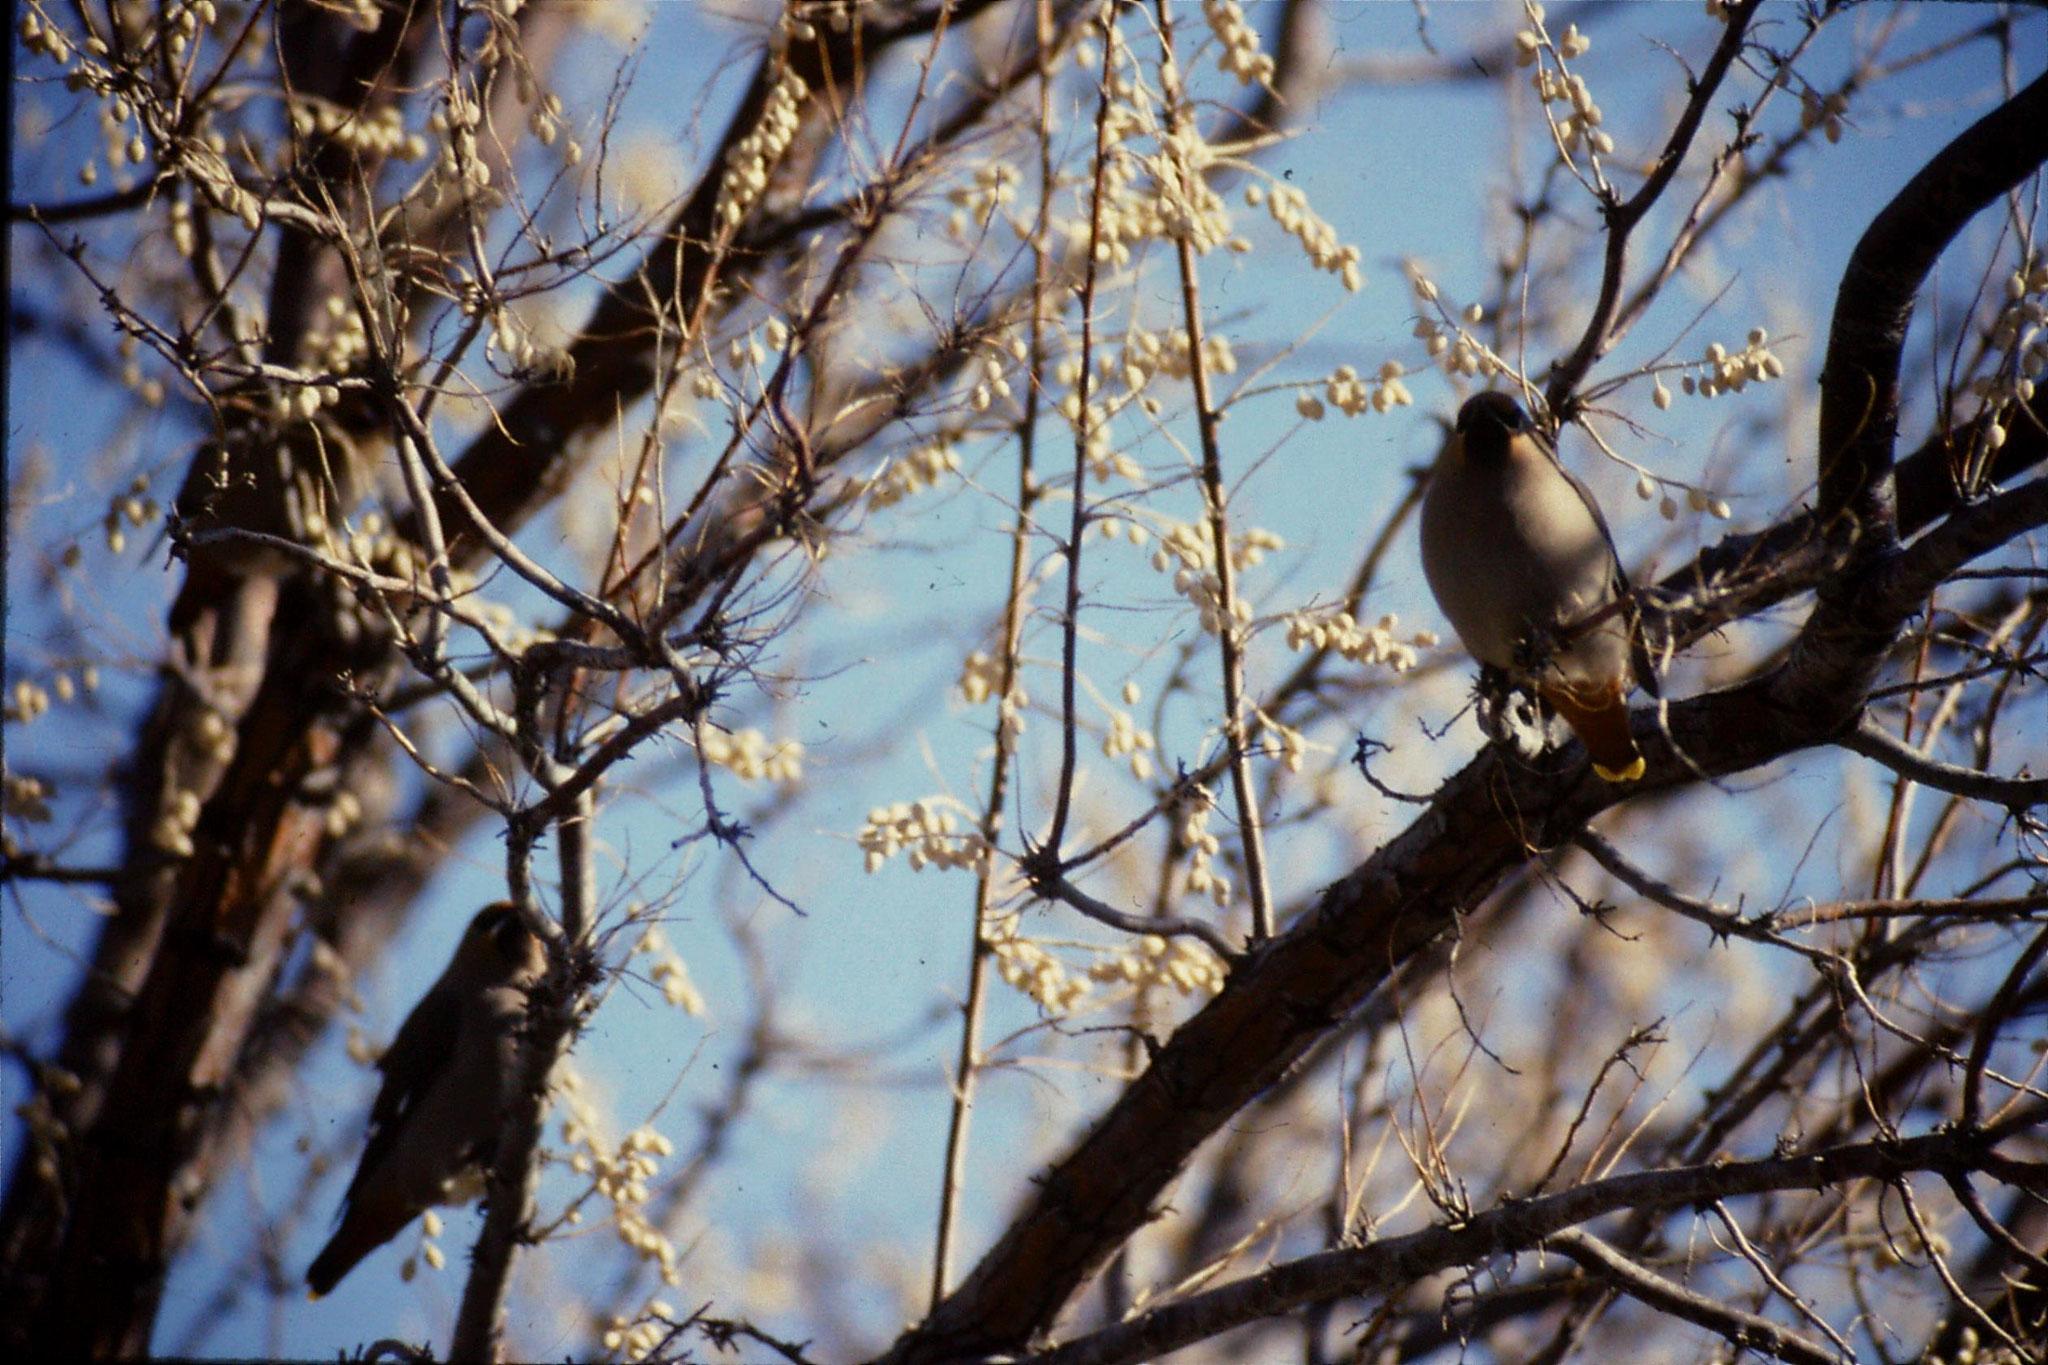 24/1/1991: 29: Bruneau Sand Dunes: Bavarian waxwings